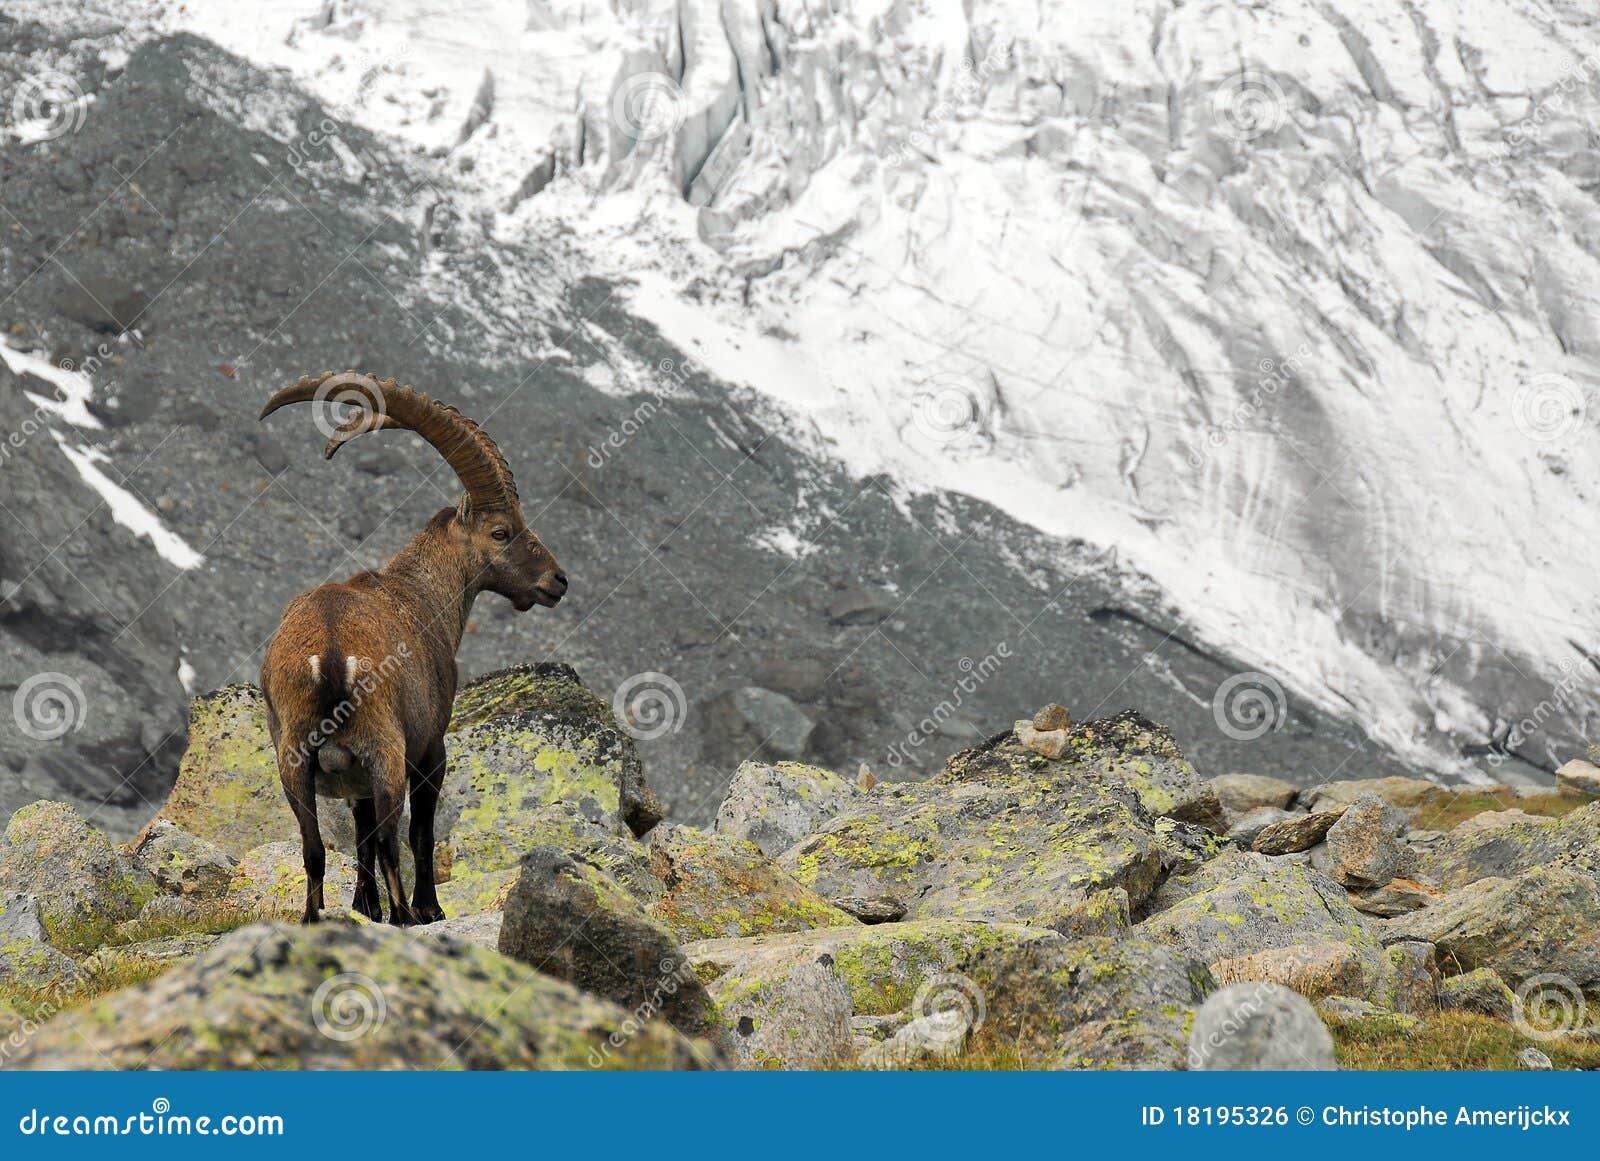 Cabra montés alpestre